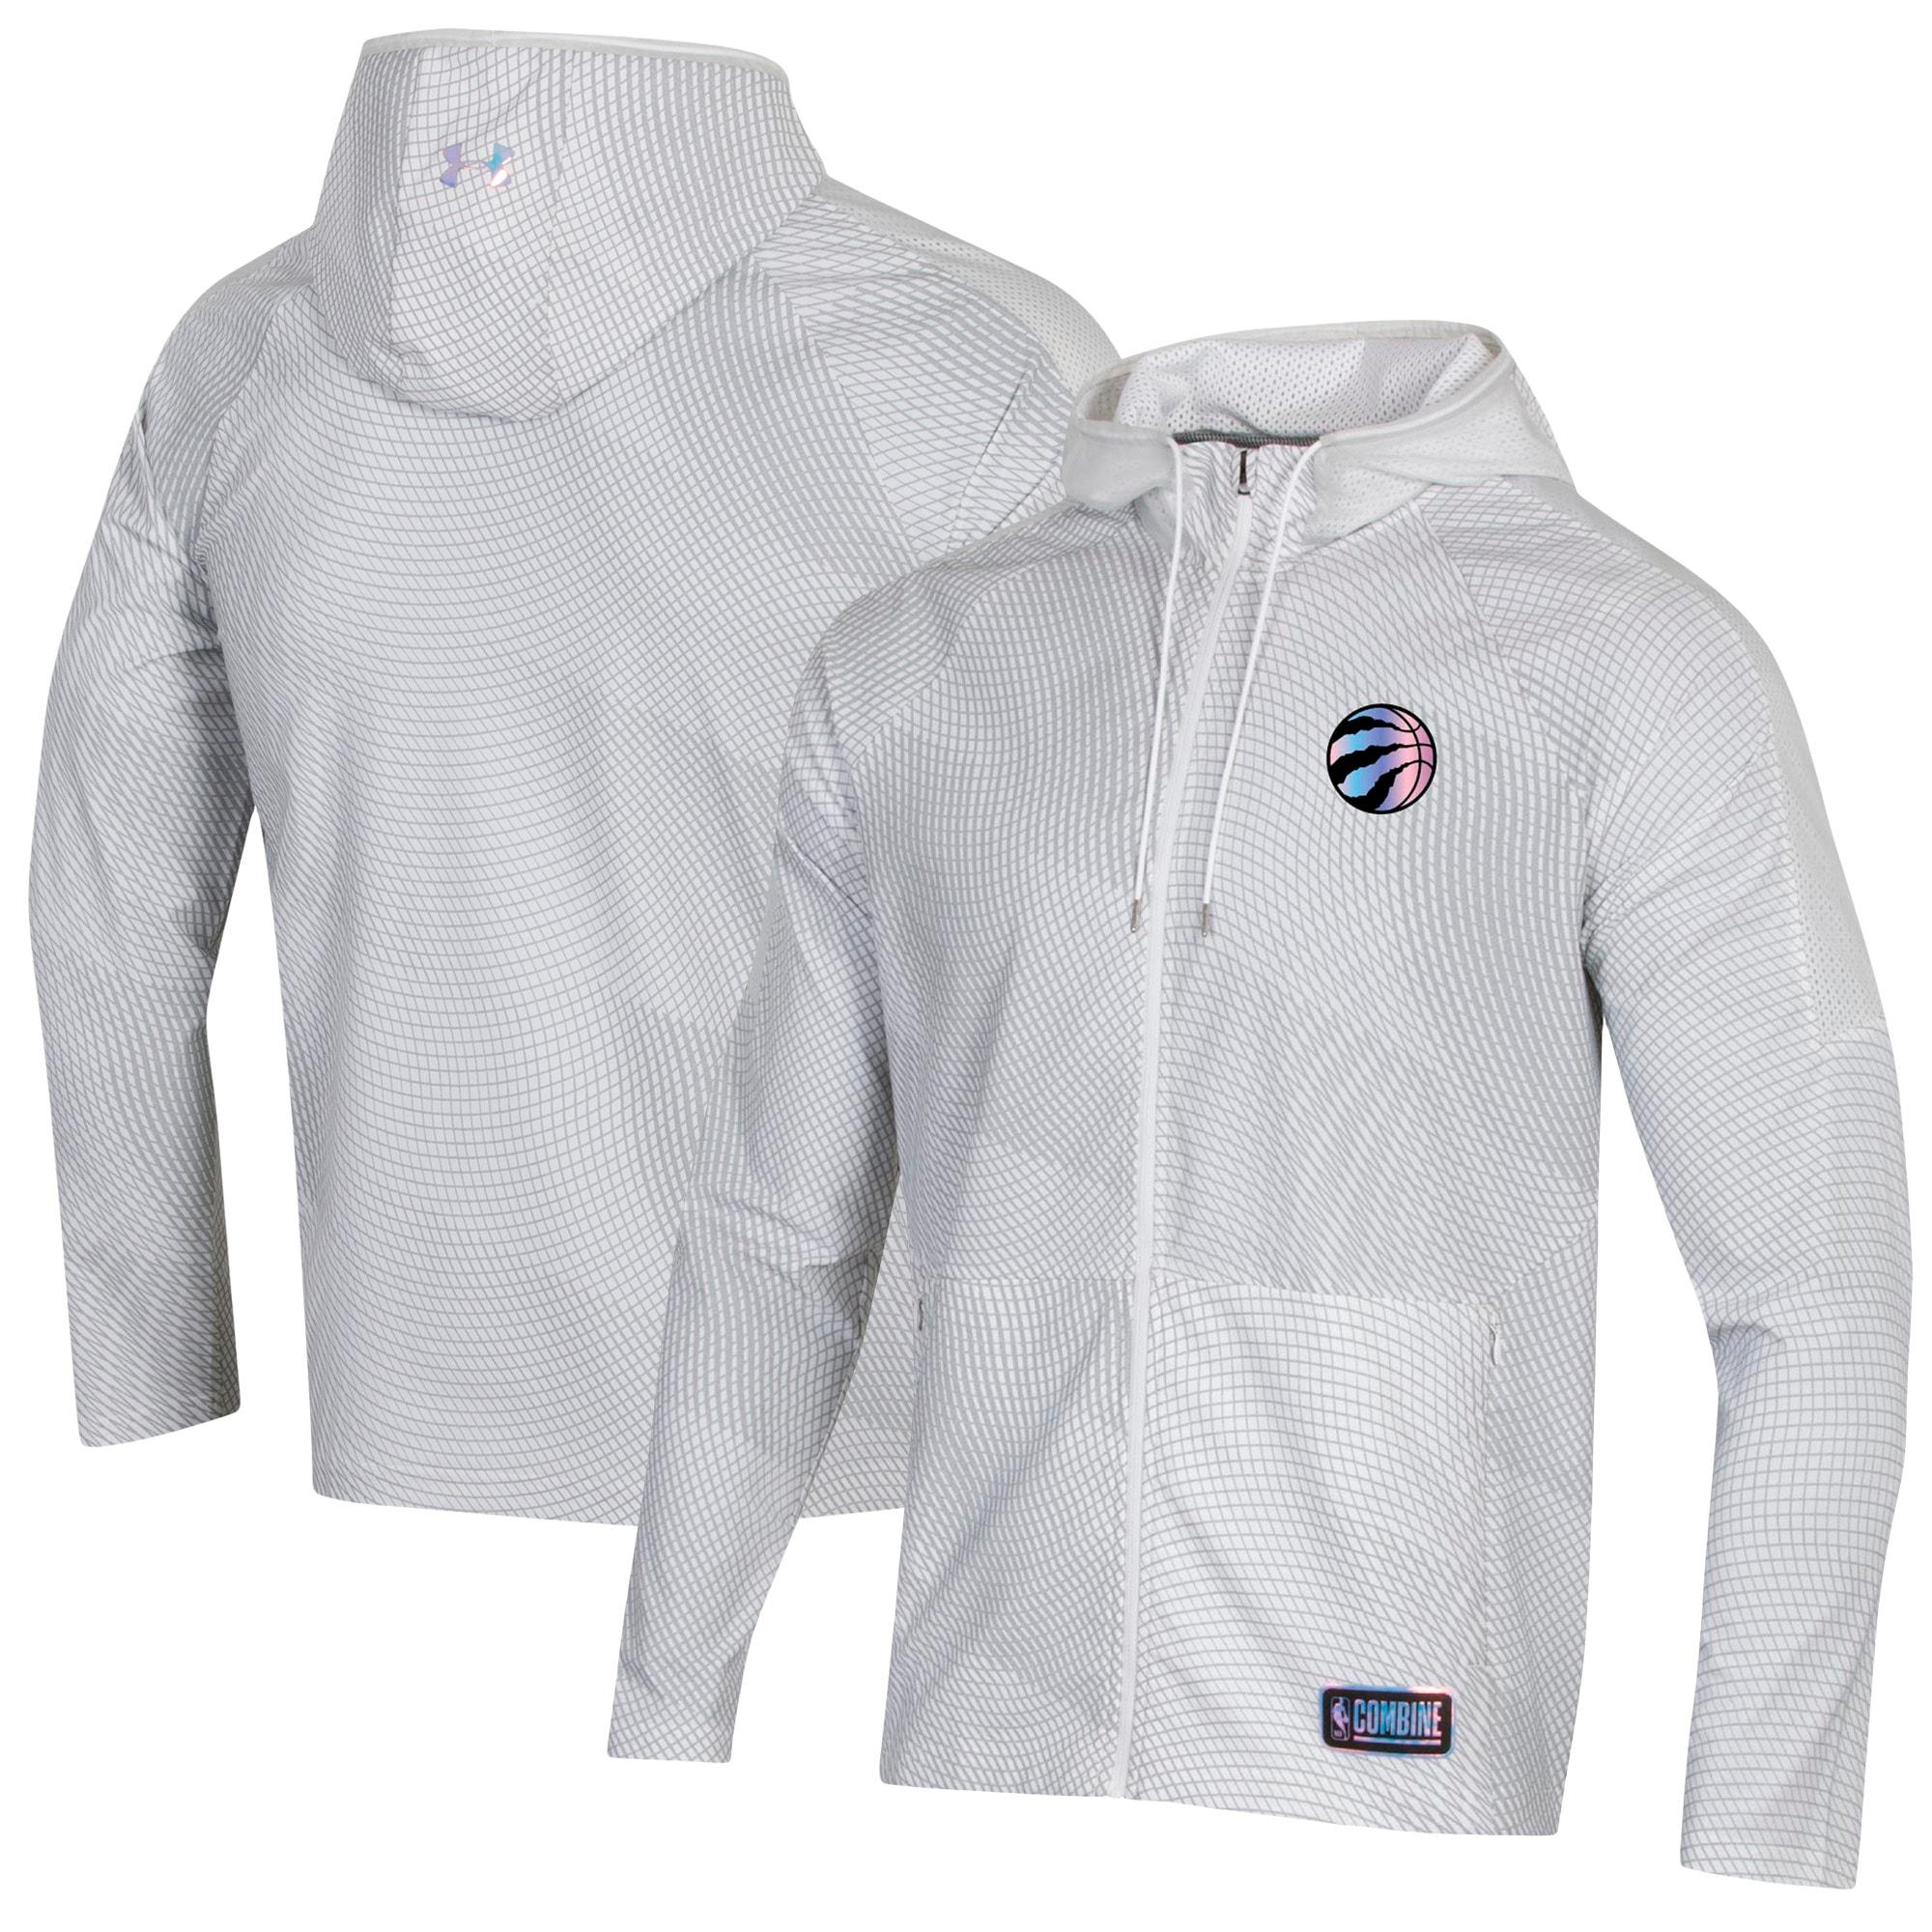 Toronto Raptors Under Armour Combine Authentic Holographic Woven Full-Zip Jacket - White